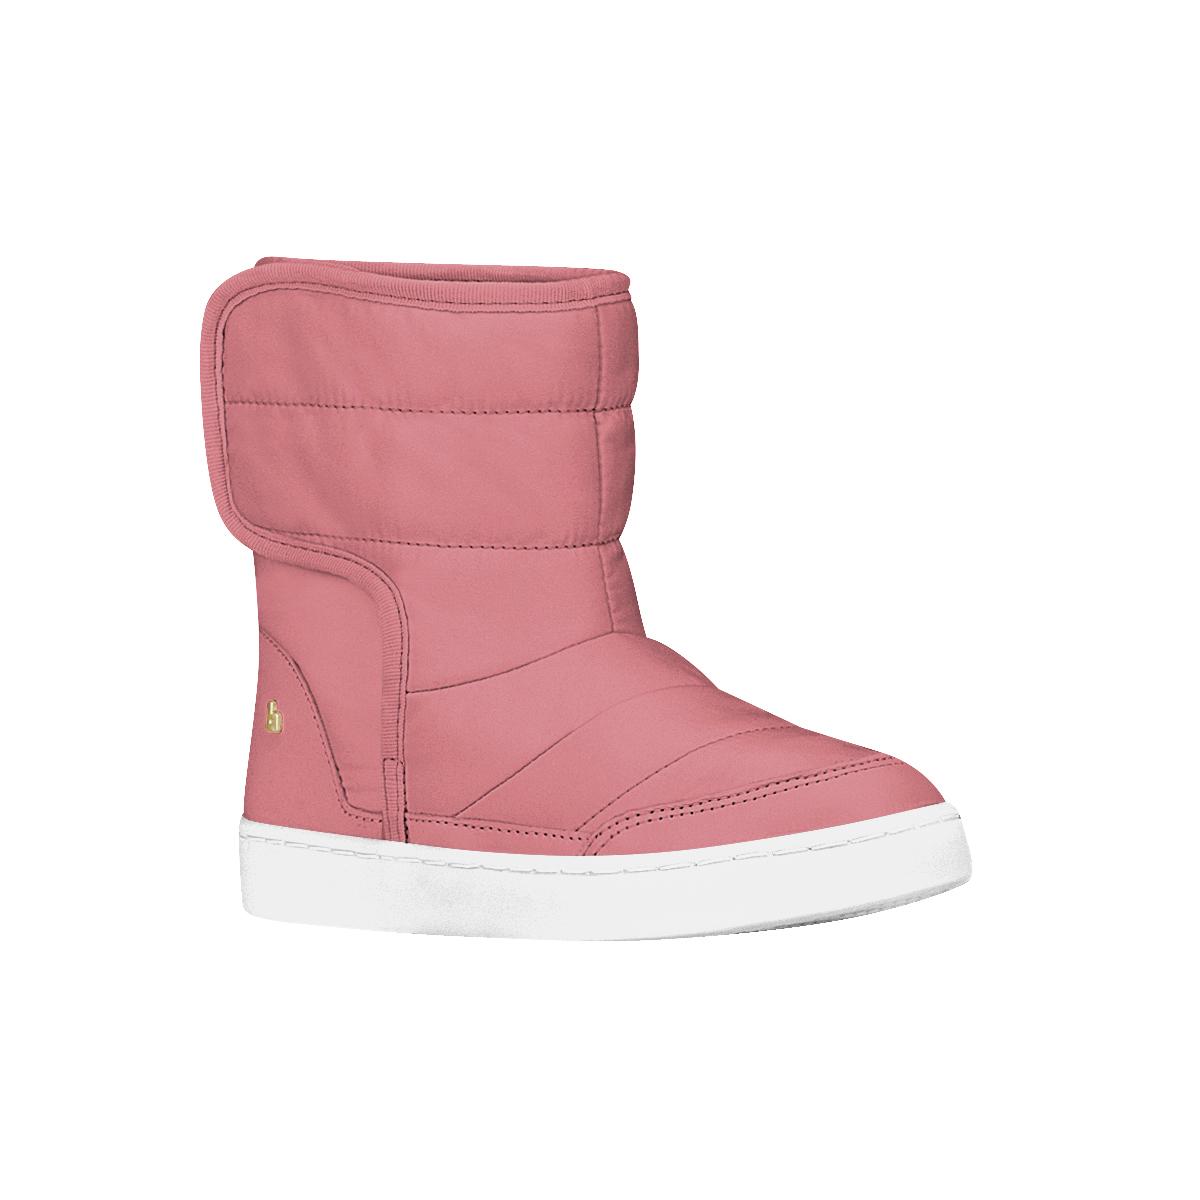 Bota Urban Boots Rosa